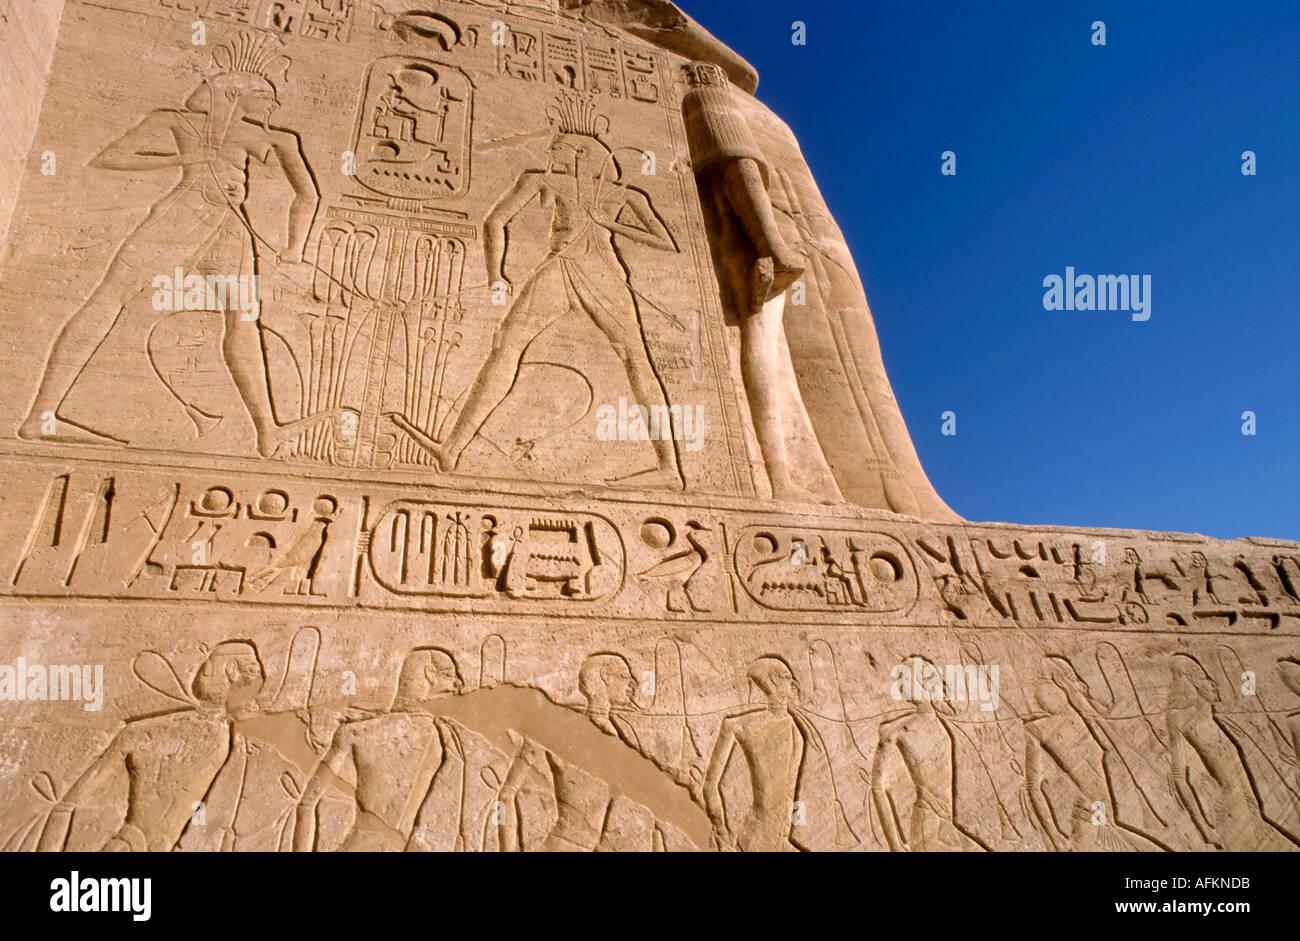 Egypt Abu Simbel - Bas-relief hieroglyphics on the Ramses 2 / ii Temple - Stock Image